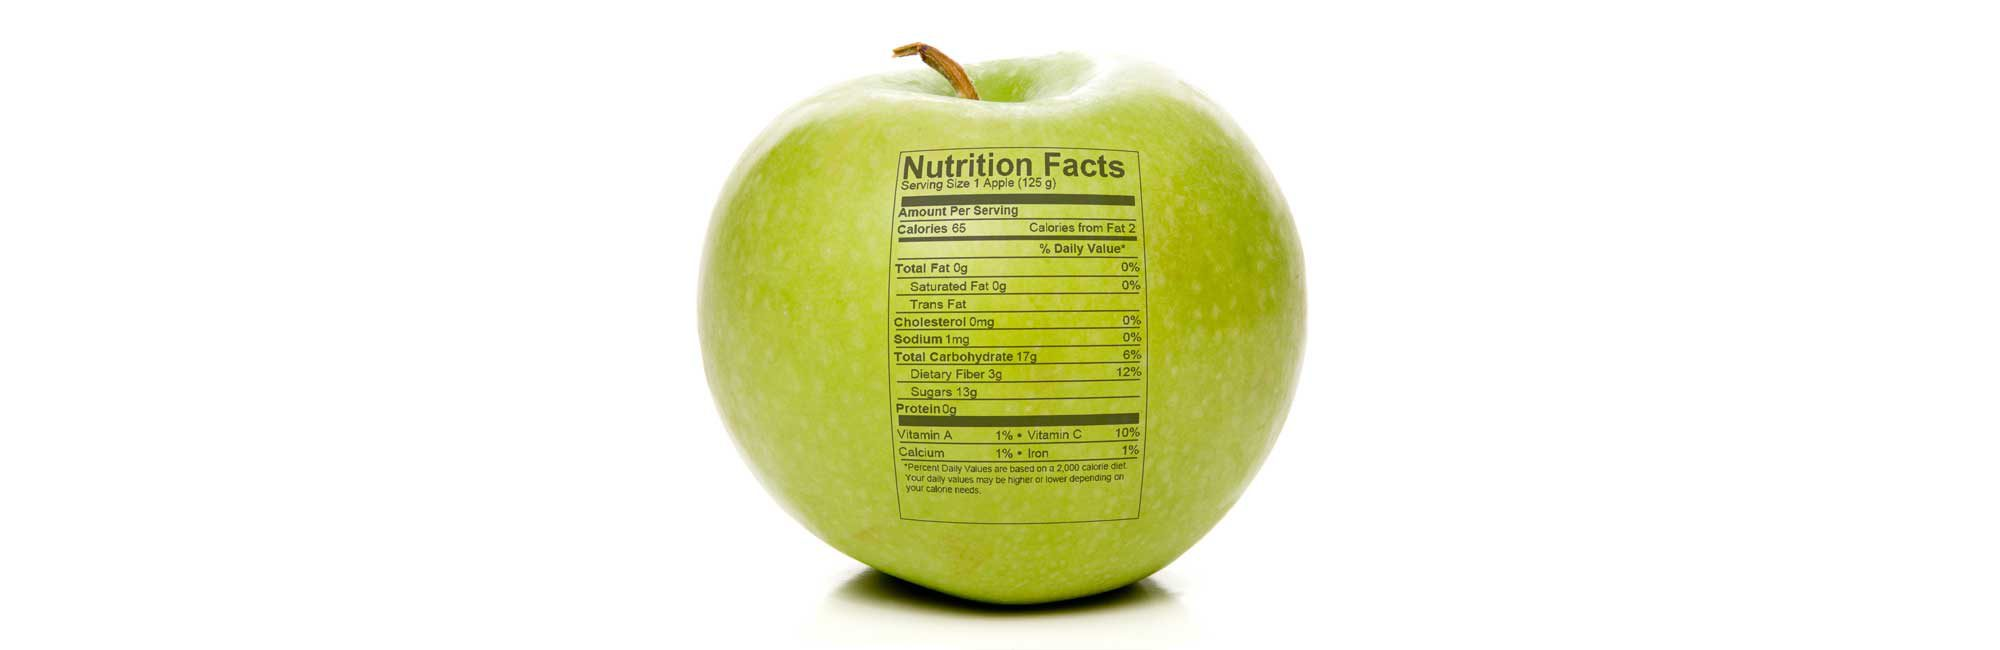 Bio-Charlotte-Fraser-Naturopathic-Nutrition